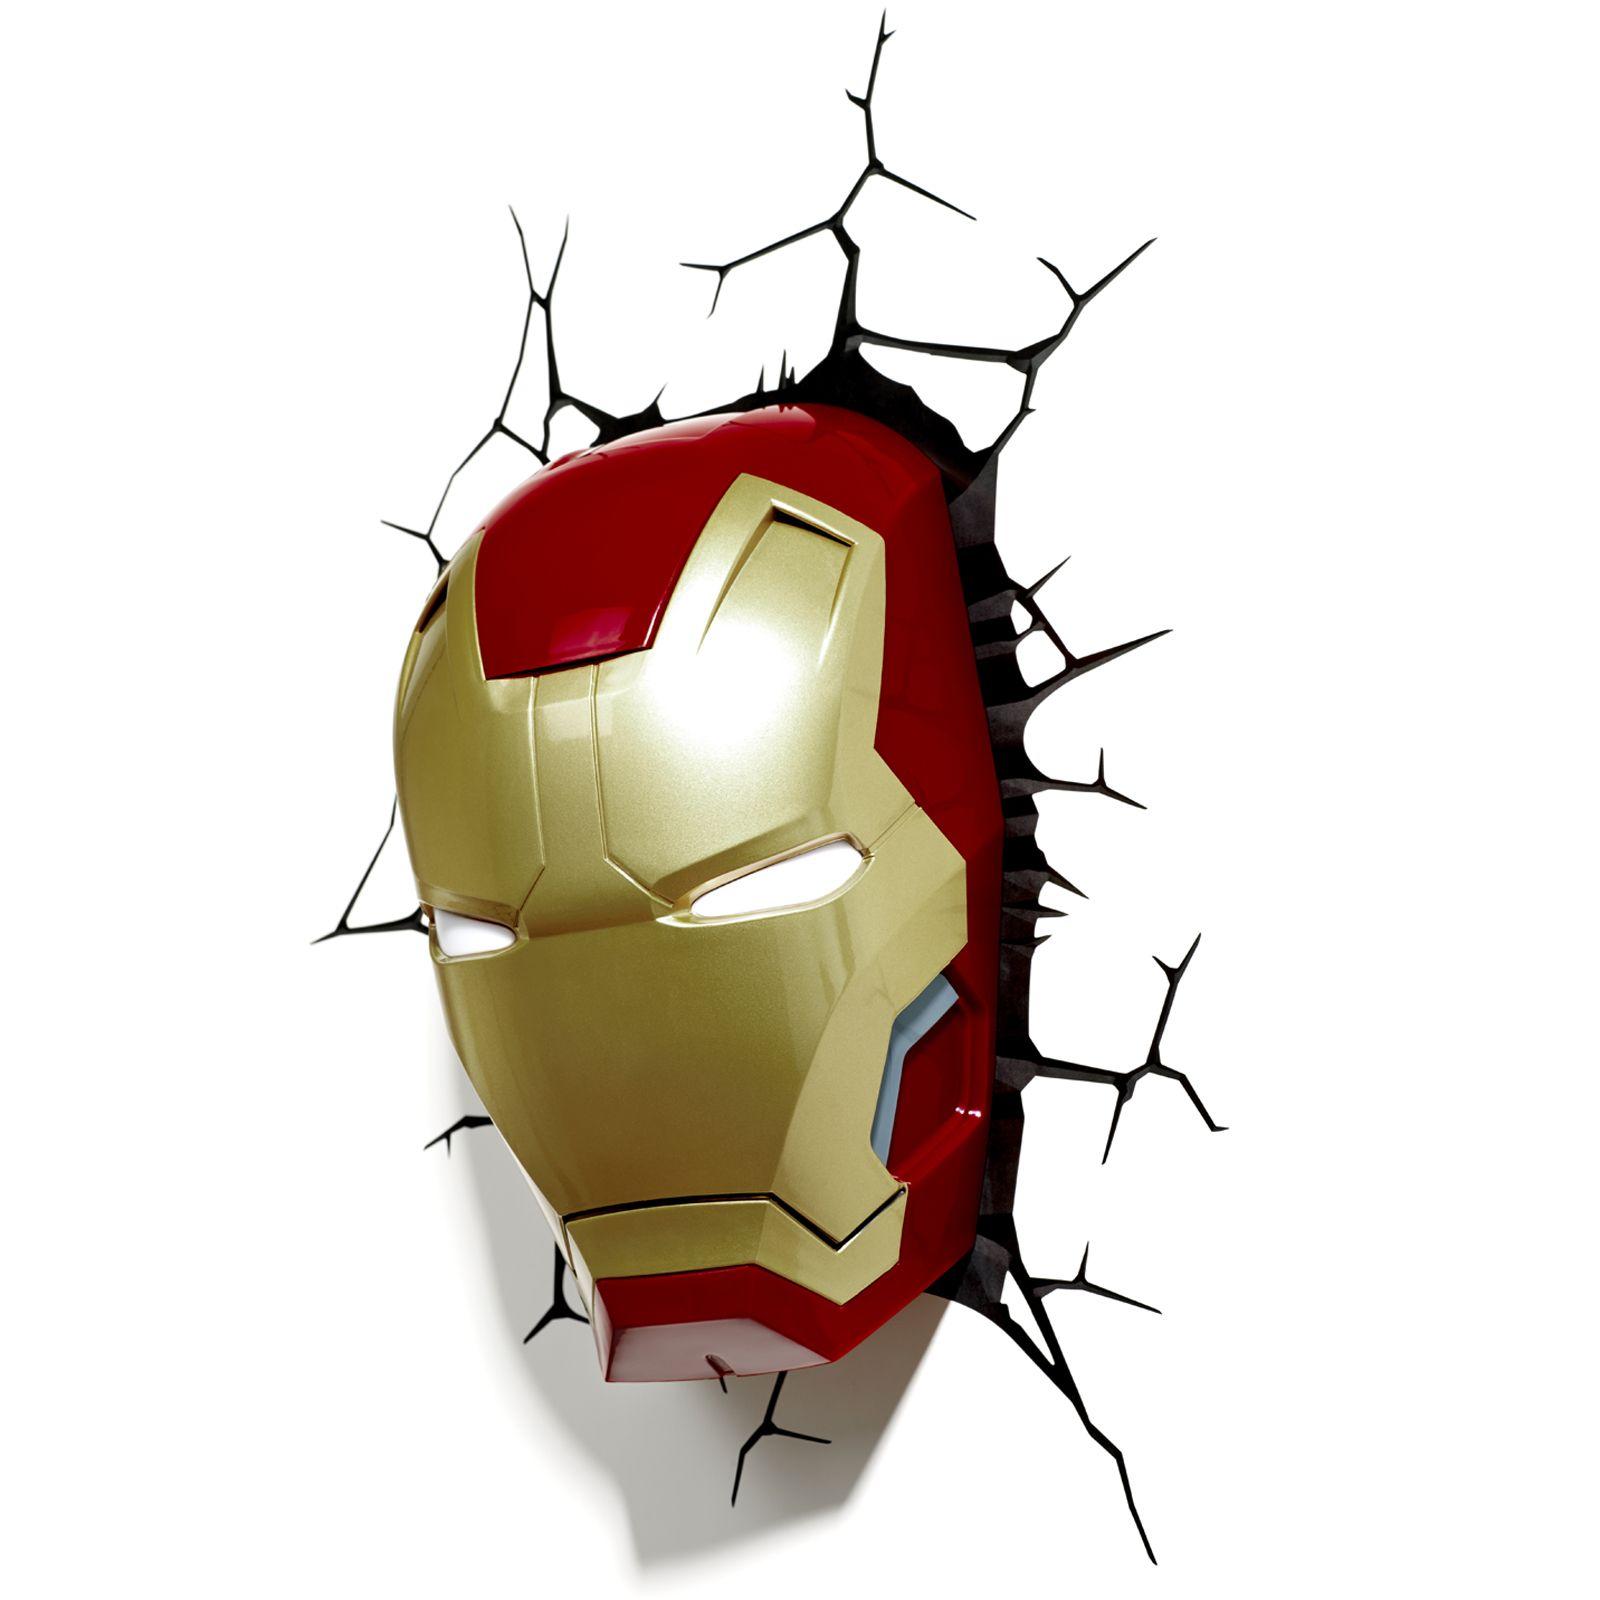 Childrens Marvel Wall Lights : MARVEL AVENGERS 3D WALL LIGHT - HULK, IRON MAN, CAPTAIN AMERICA, THOR, SPIDERMAN eBay